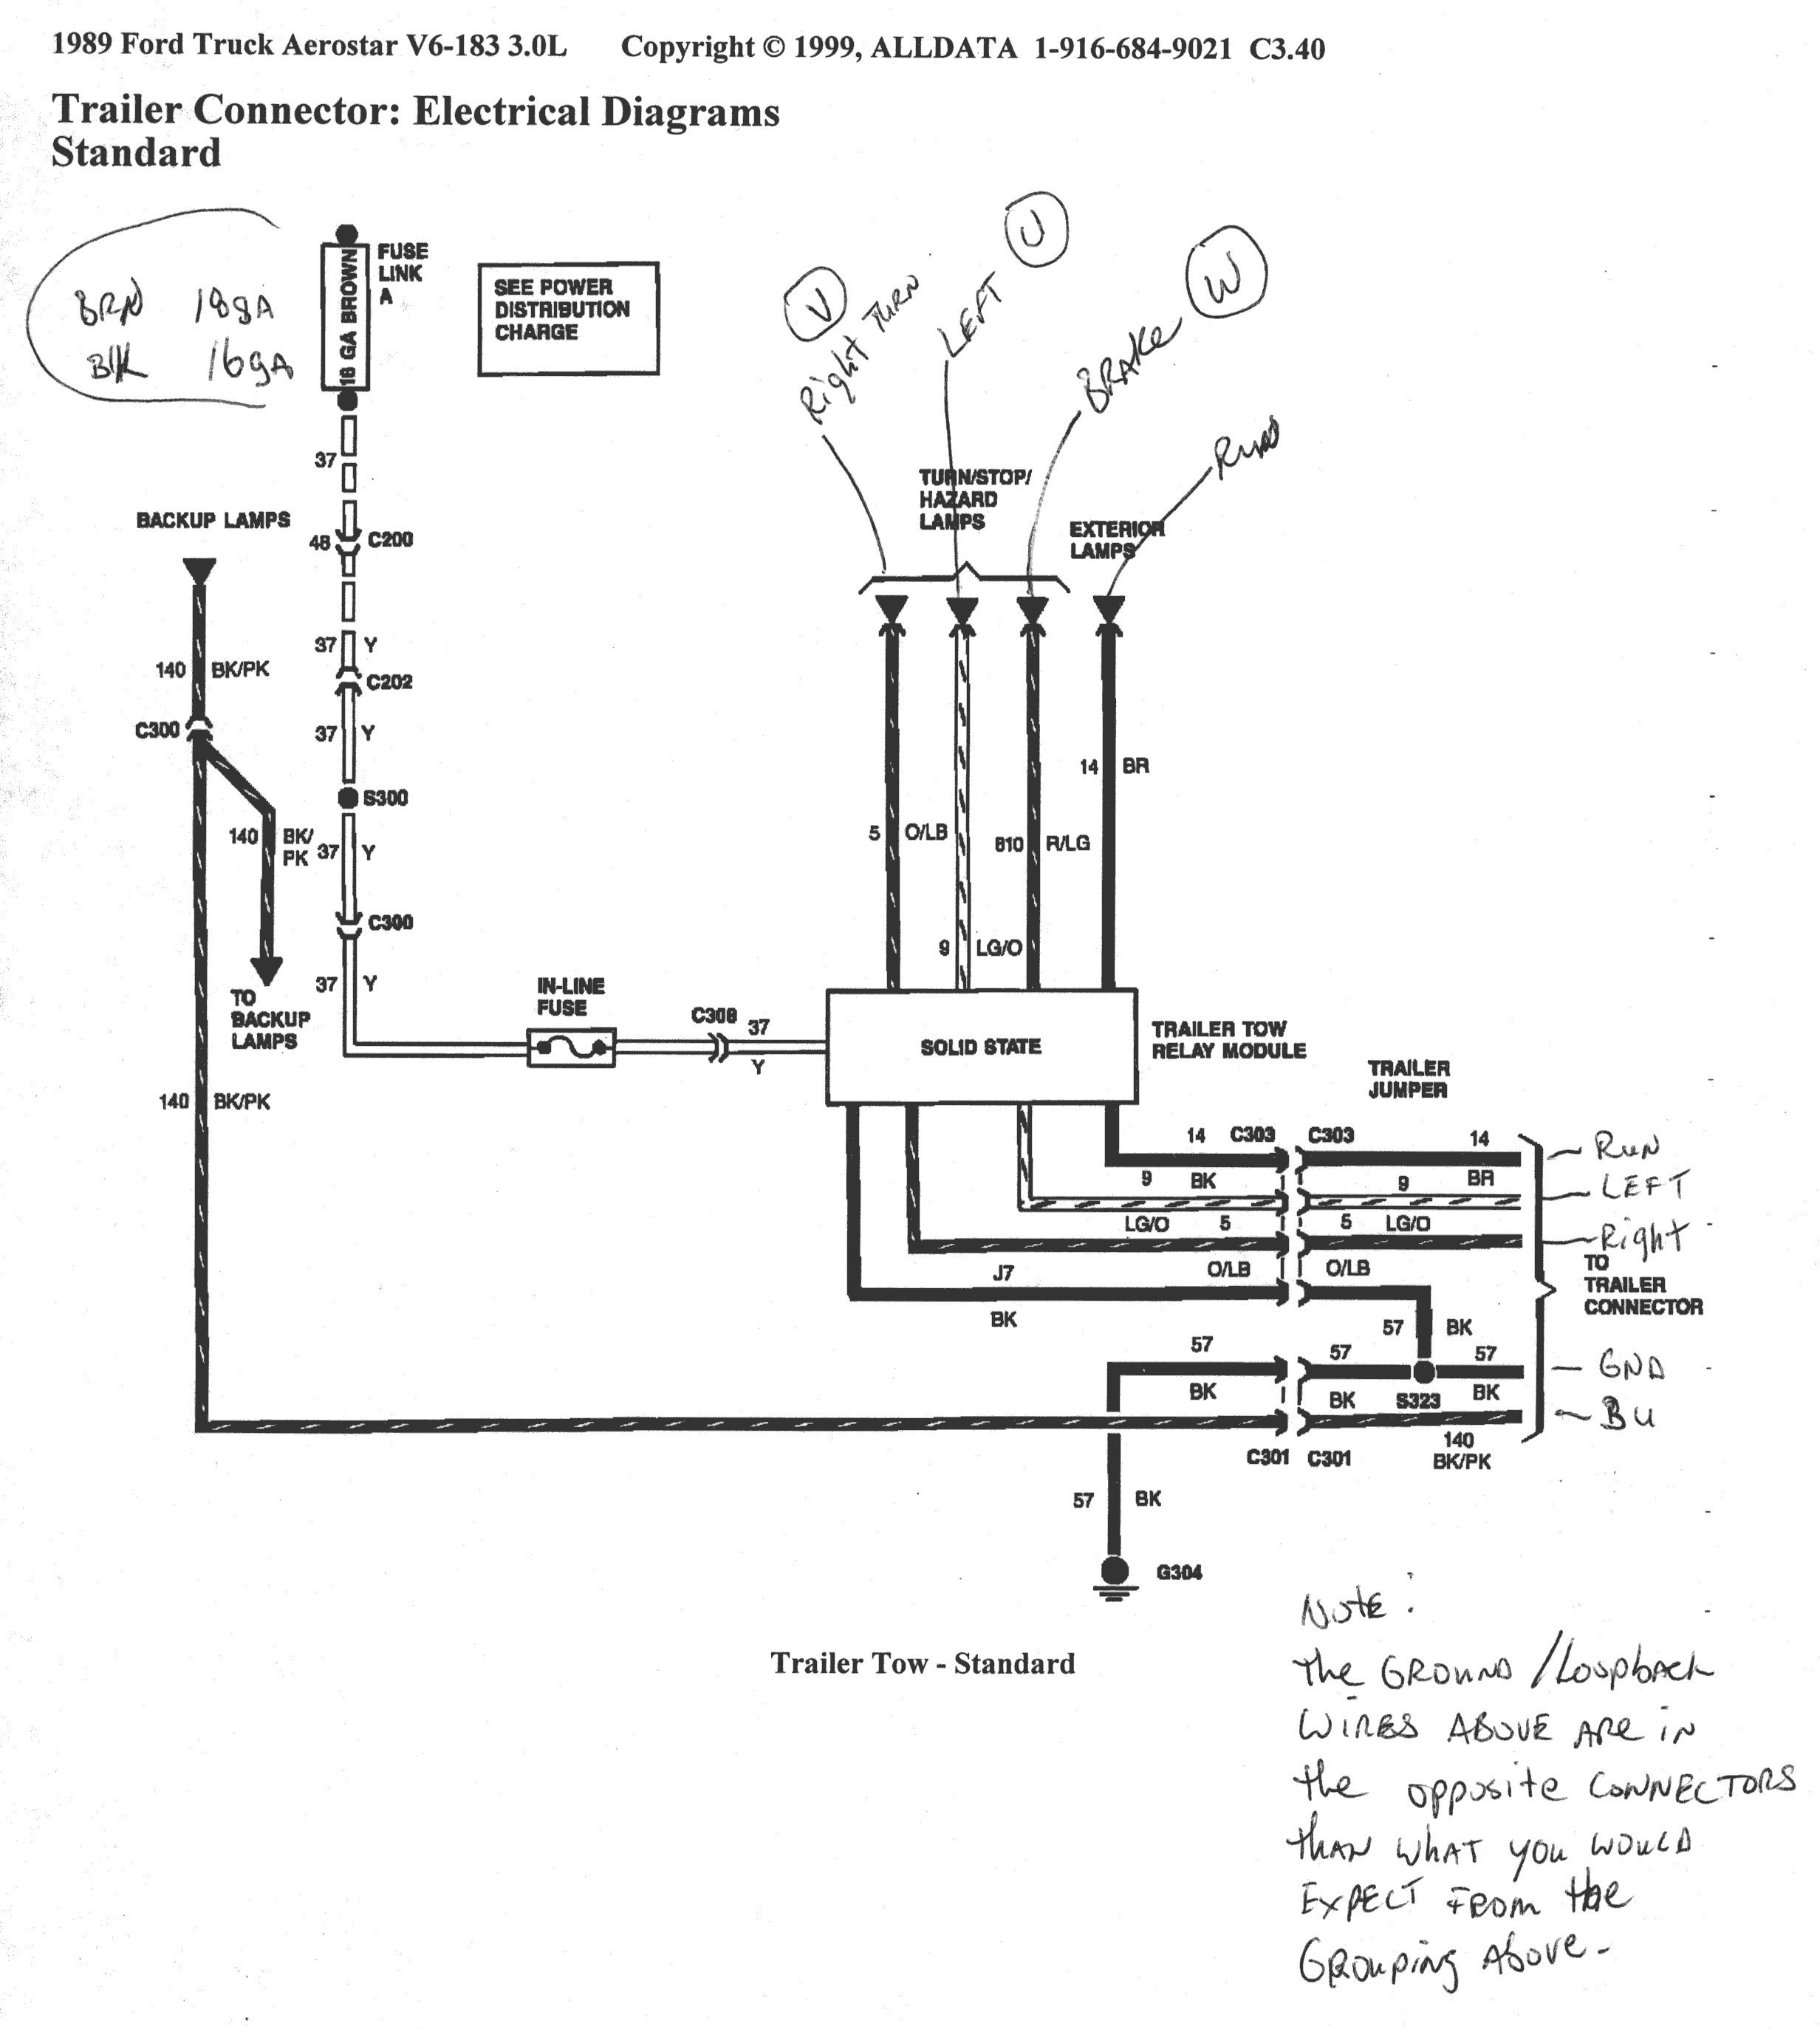 Mitsubishi Trailer Wiring Diagram Diagrams 2001 Eclipse Engine Pajero My Triton